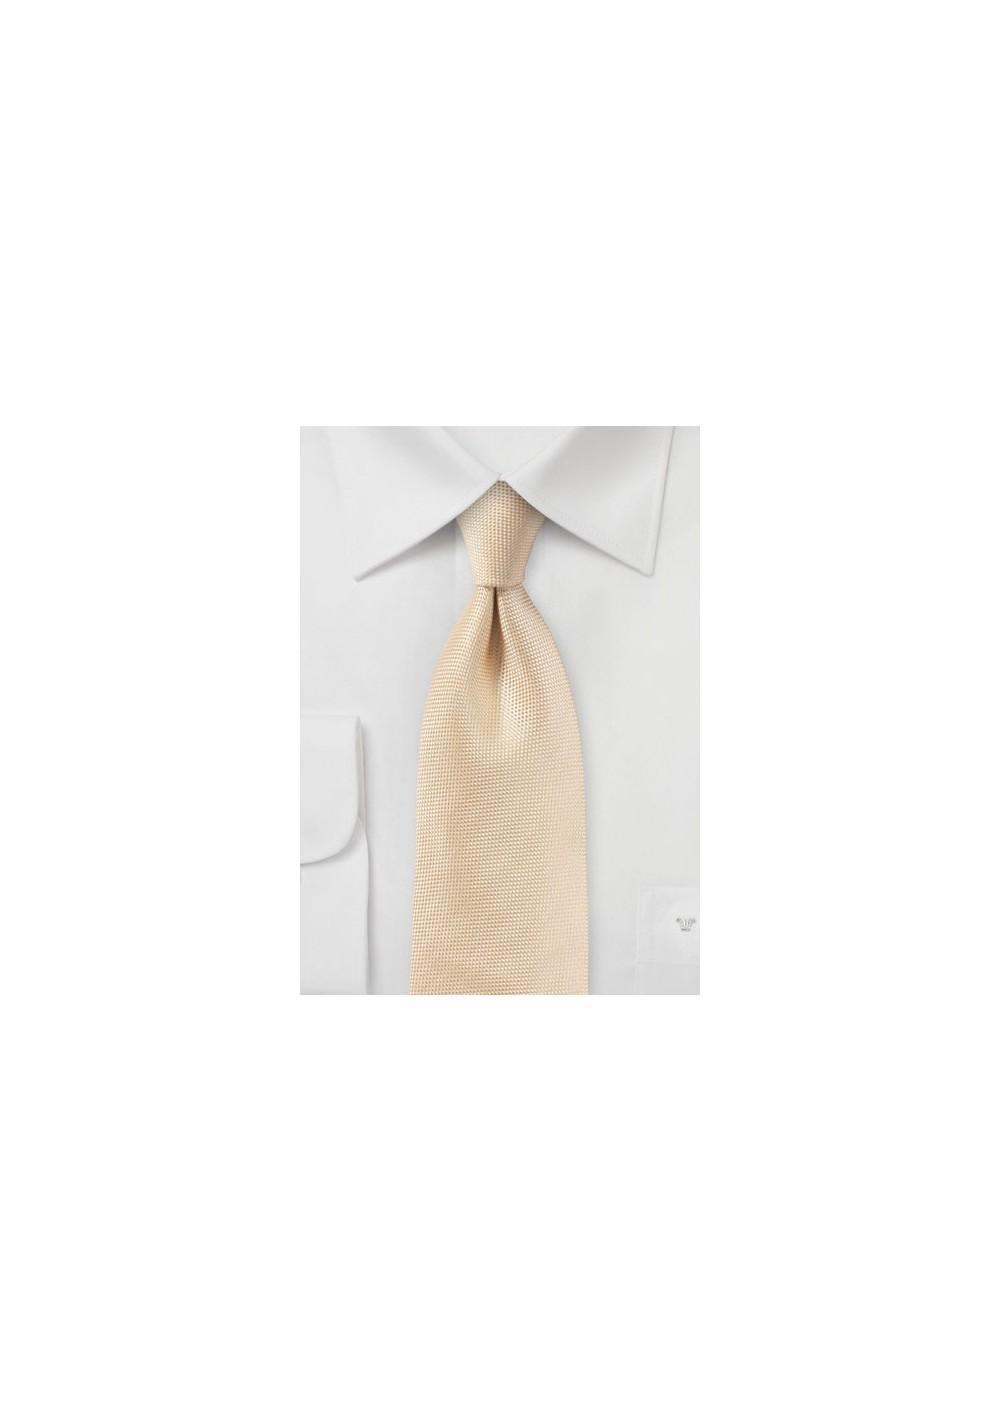 Textured Tie in Peach Apricot